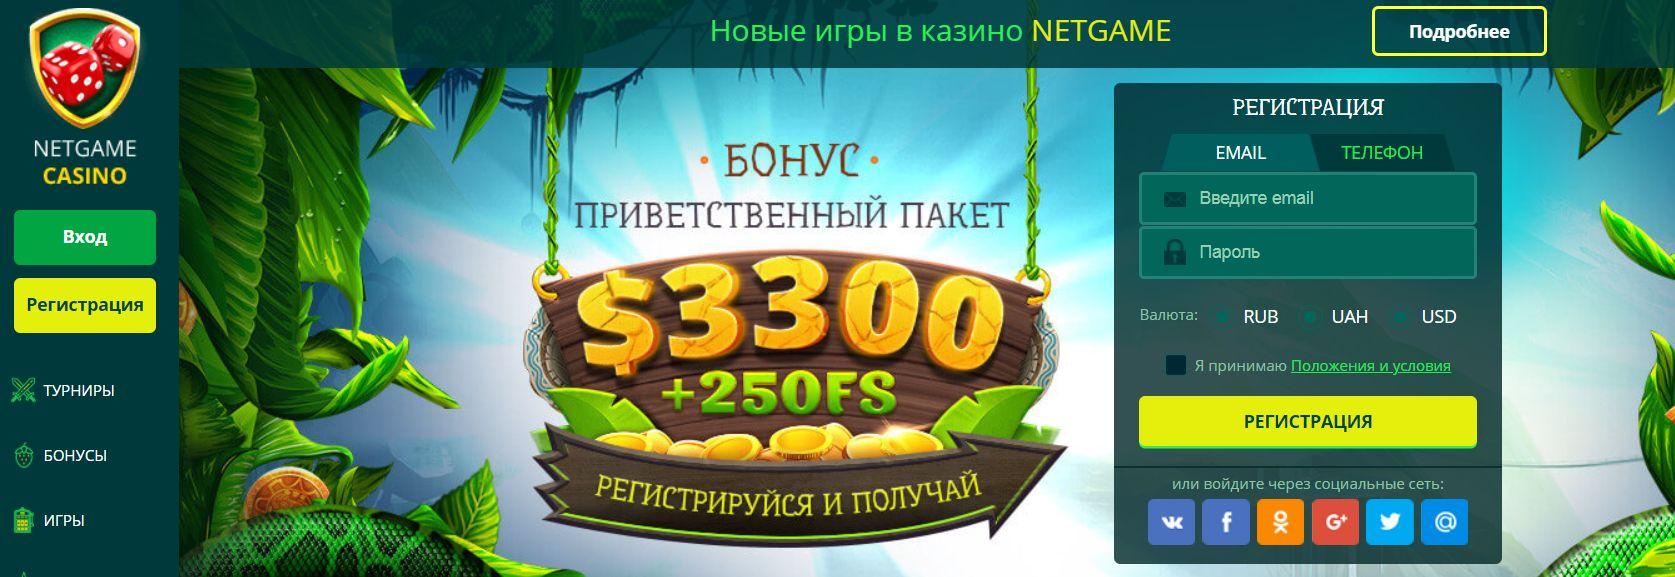 Netgame casino - Официальный сайт